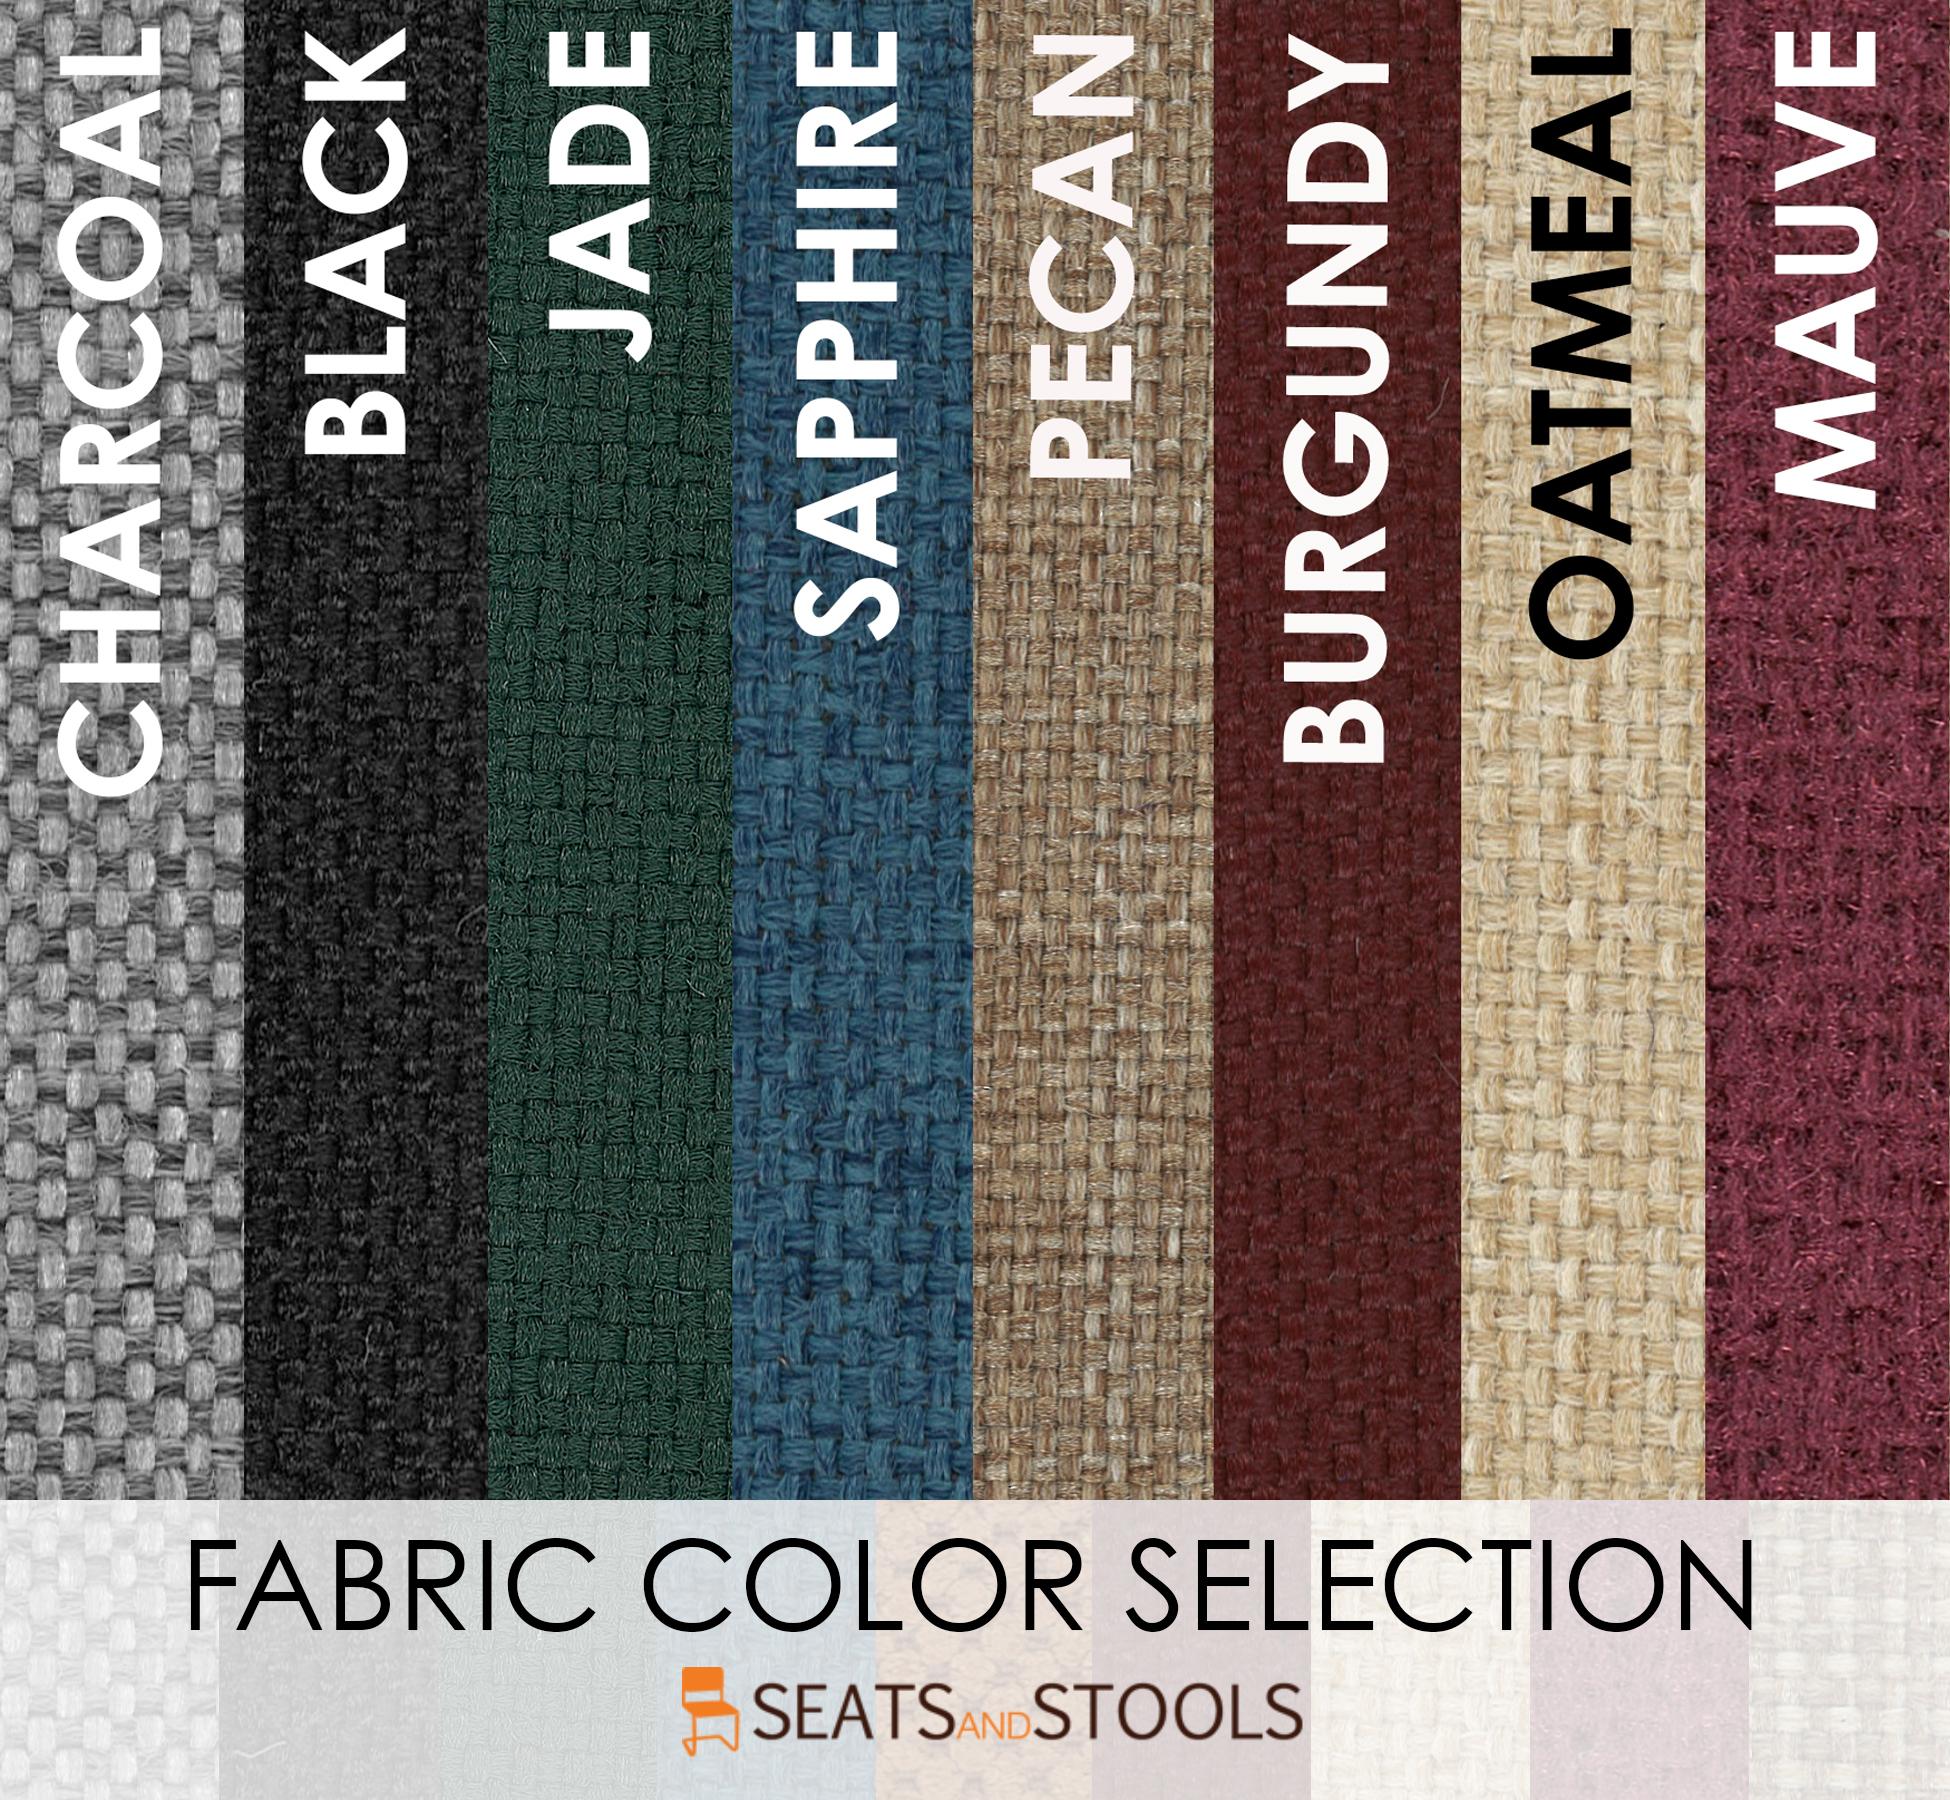 fabric-colors-053016.jpg